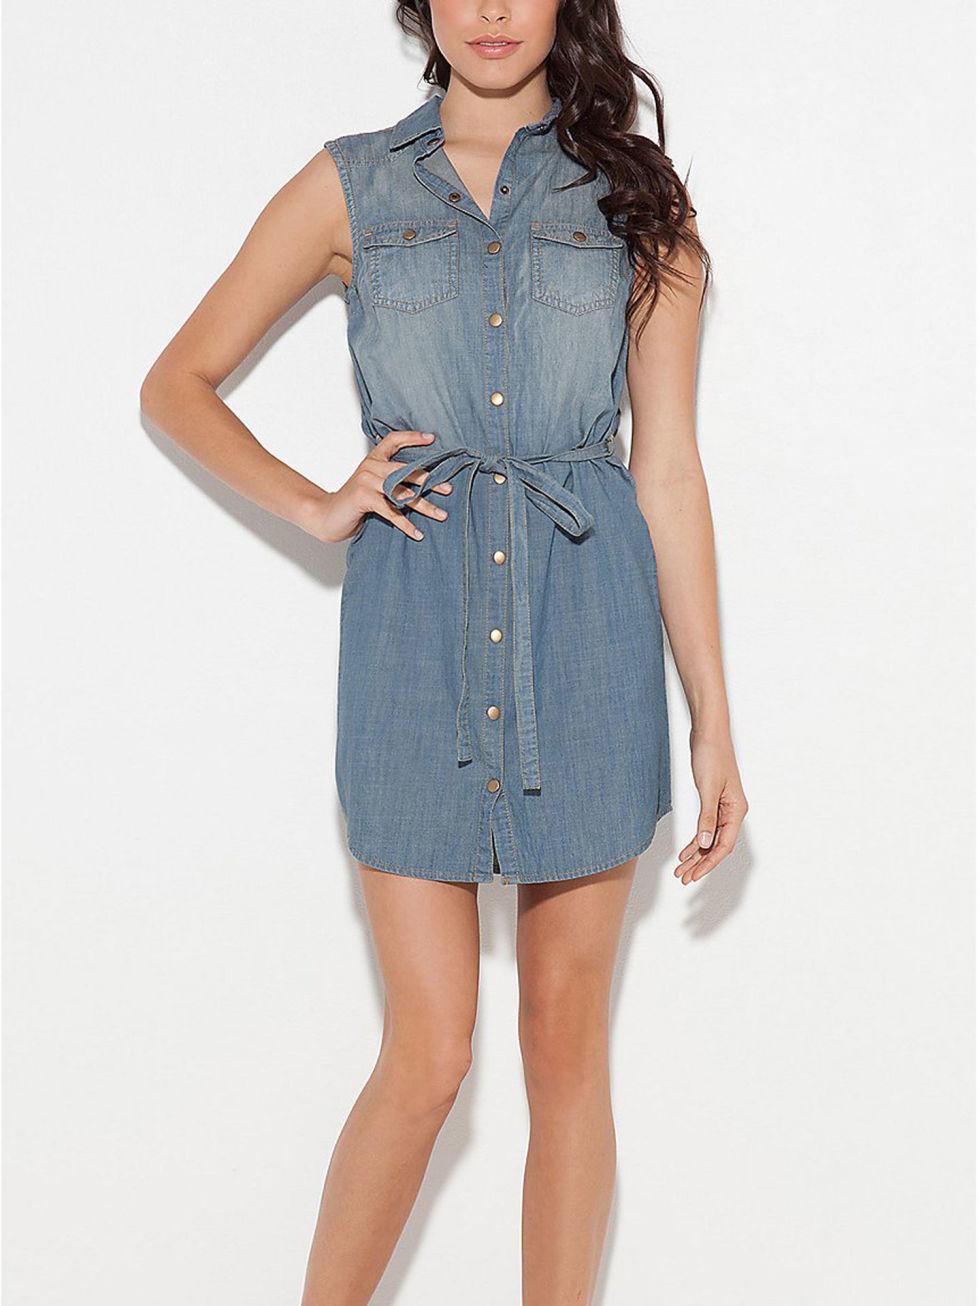 Hot Summer Dresses Under 50 - Inexpensive Summer Dresses